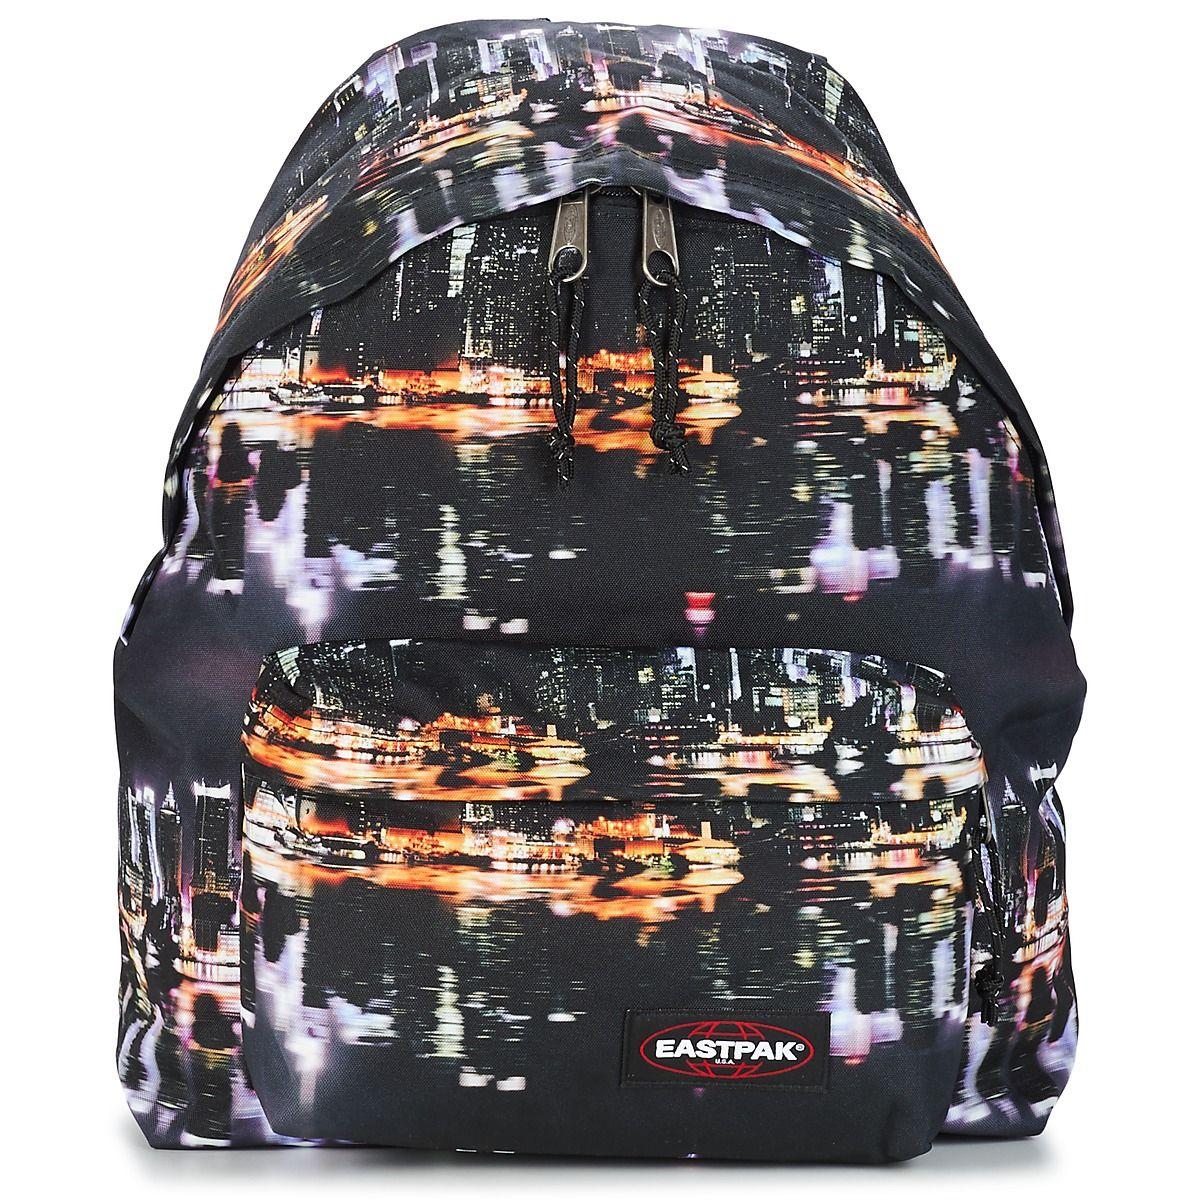 b04ea5f046 Sac à dos Eastpak PADDED PAK'R Noir | eastpack | Bags, Backpacks ...